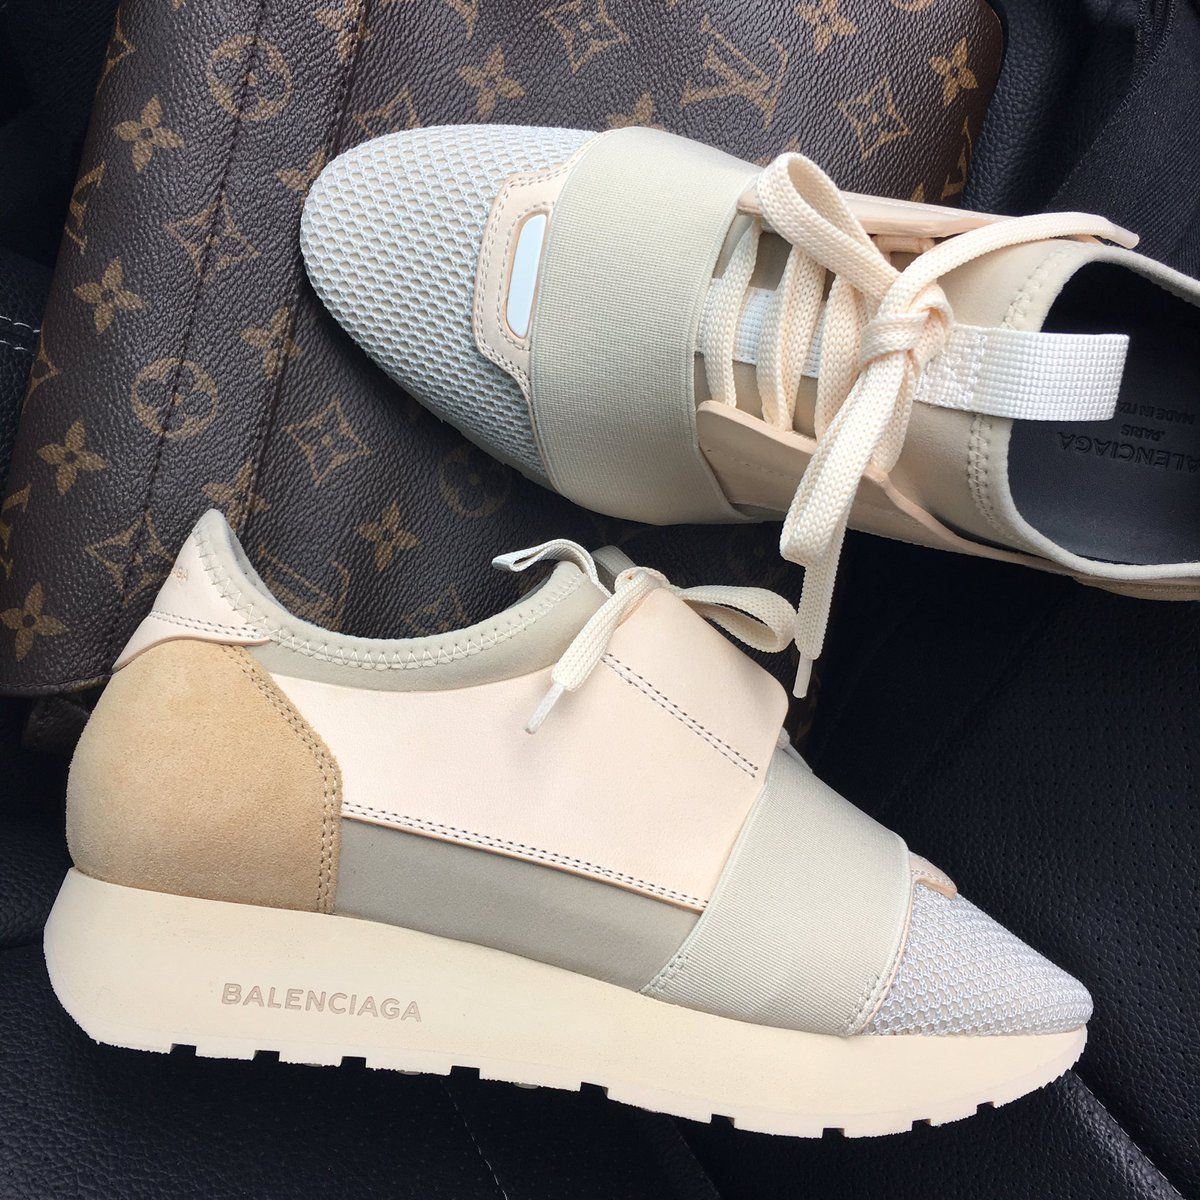 Balenciaga Runners x Louis Vuitton